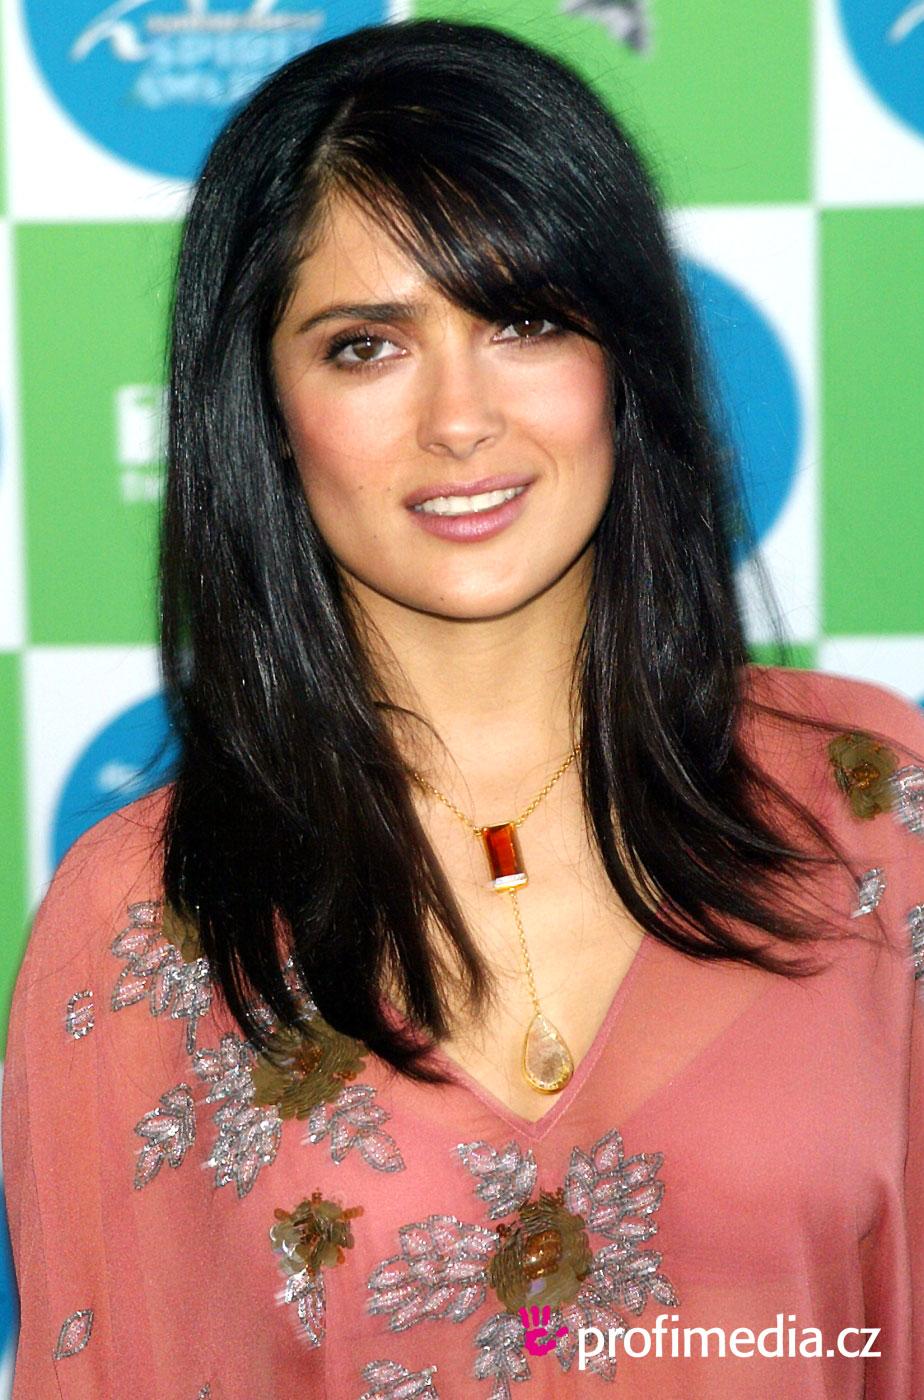 Prom hairstyle - Salma Hayek - Salma Hayek